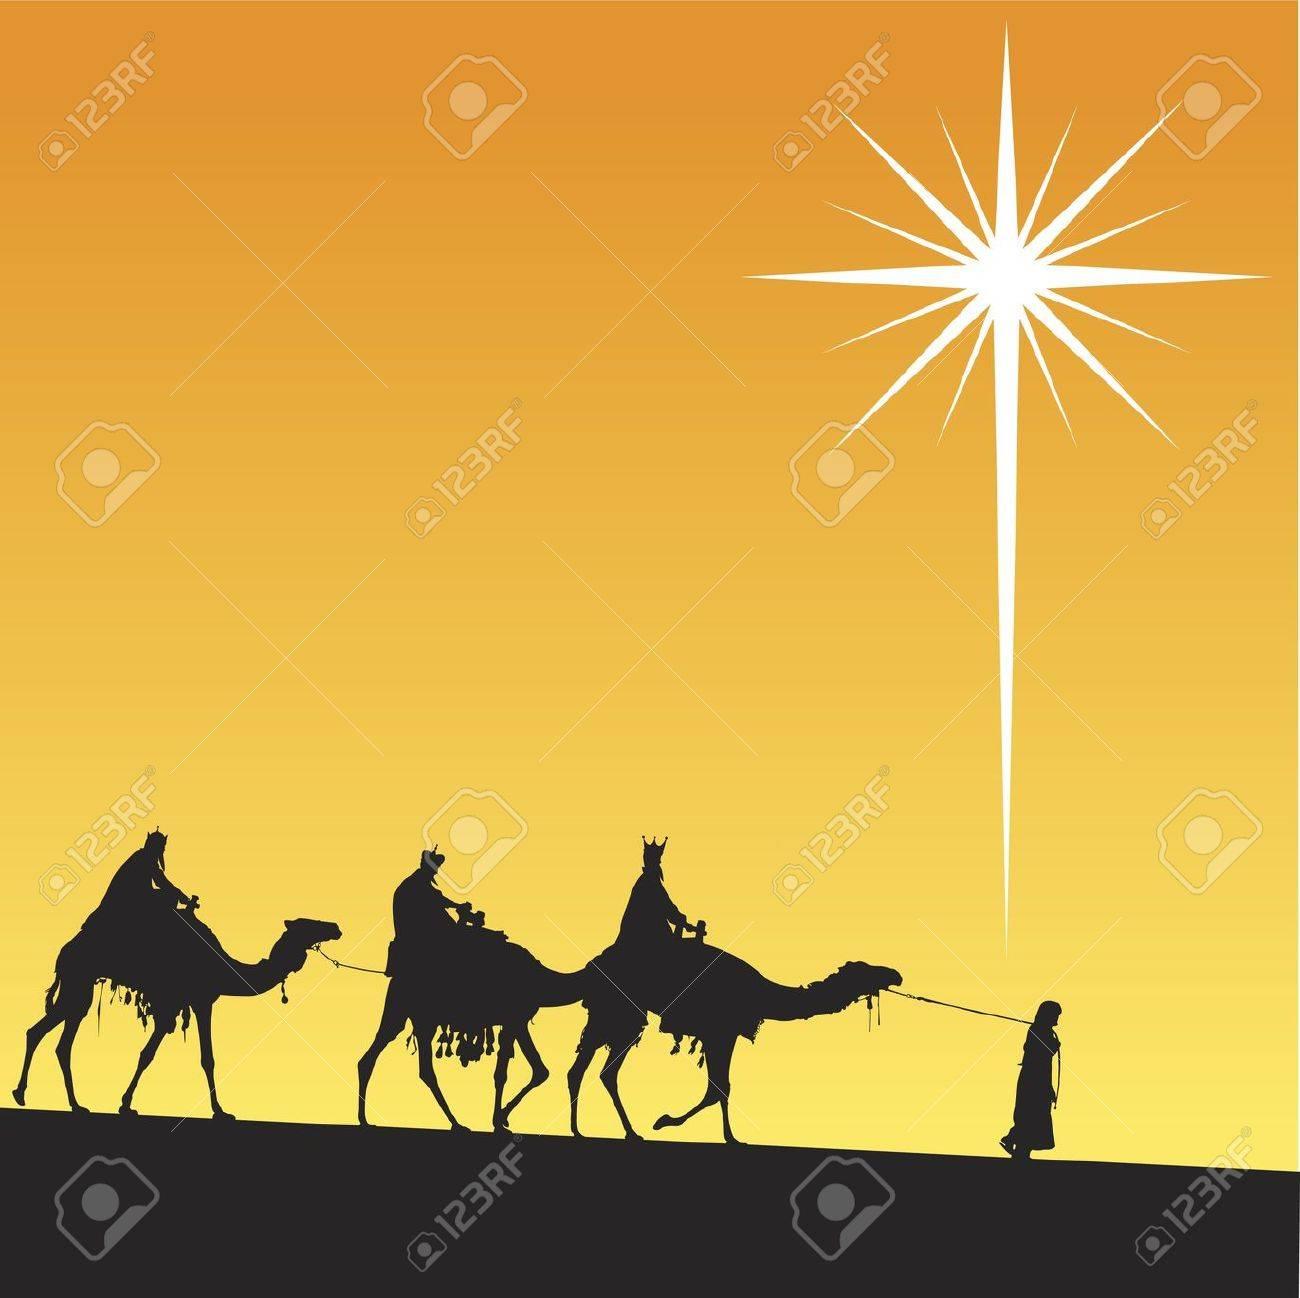 Classic three magic scene and shining star of Bethlehem. Stock Vector - 8045227